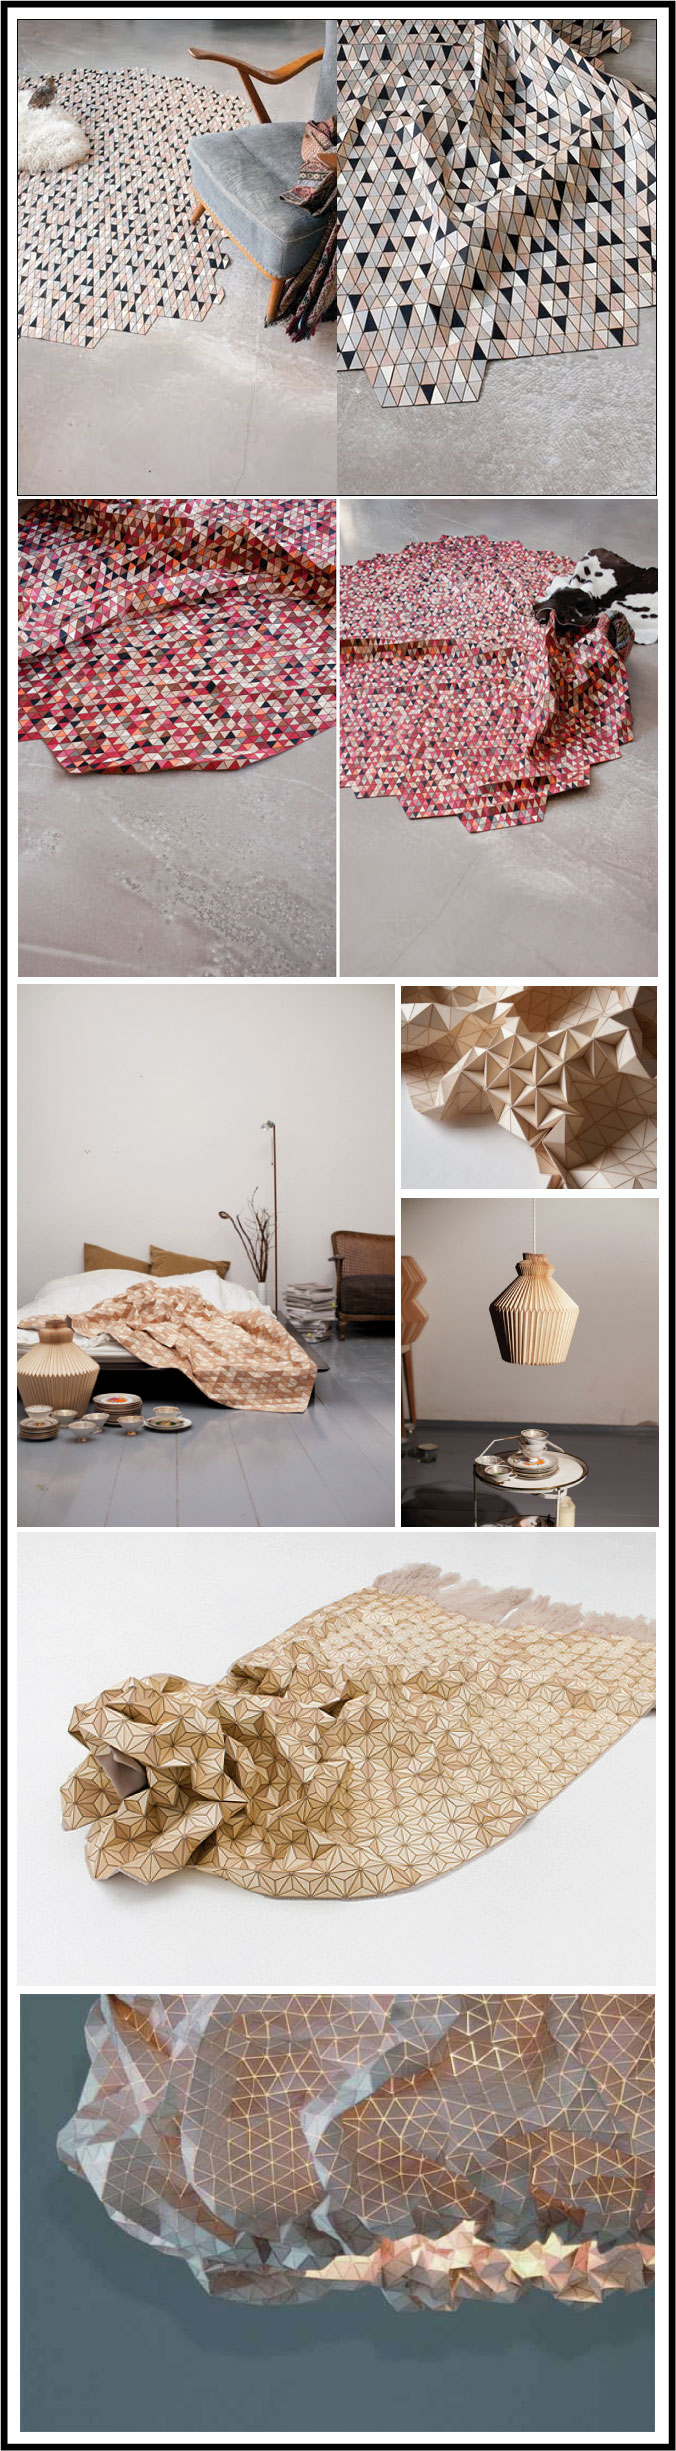 Elisa-Strozik designer lampes et tapis en bois par chiara stella home